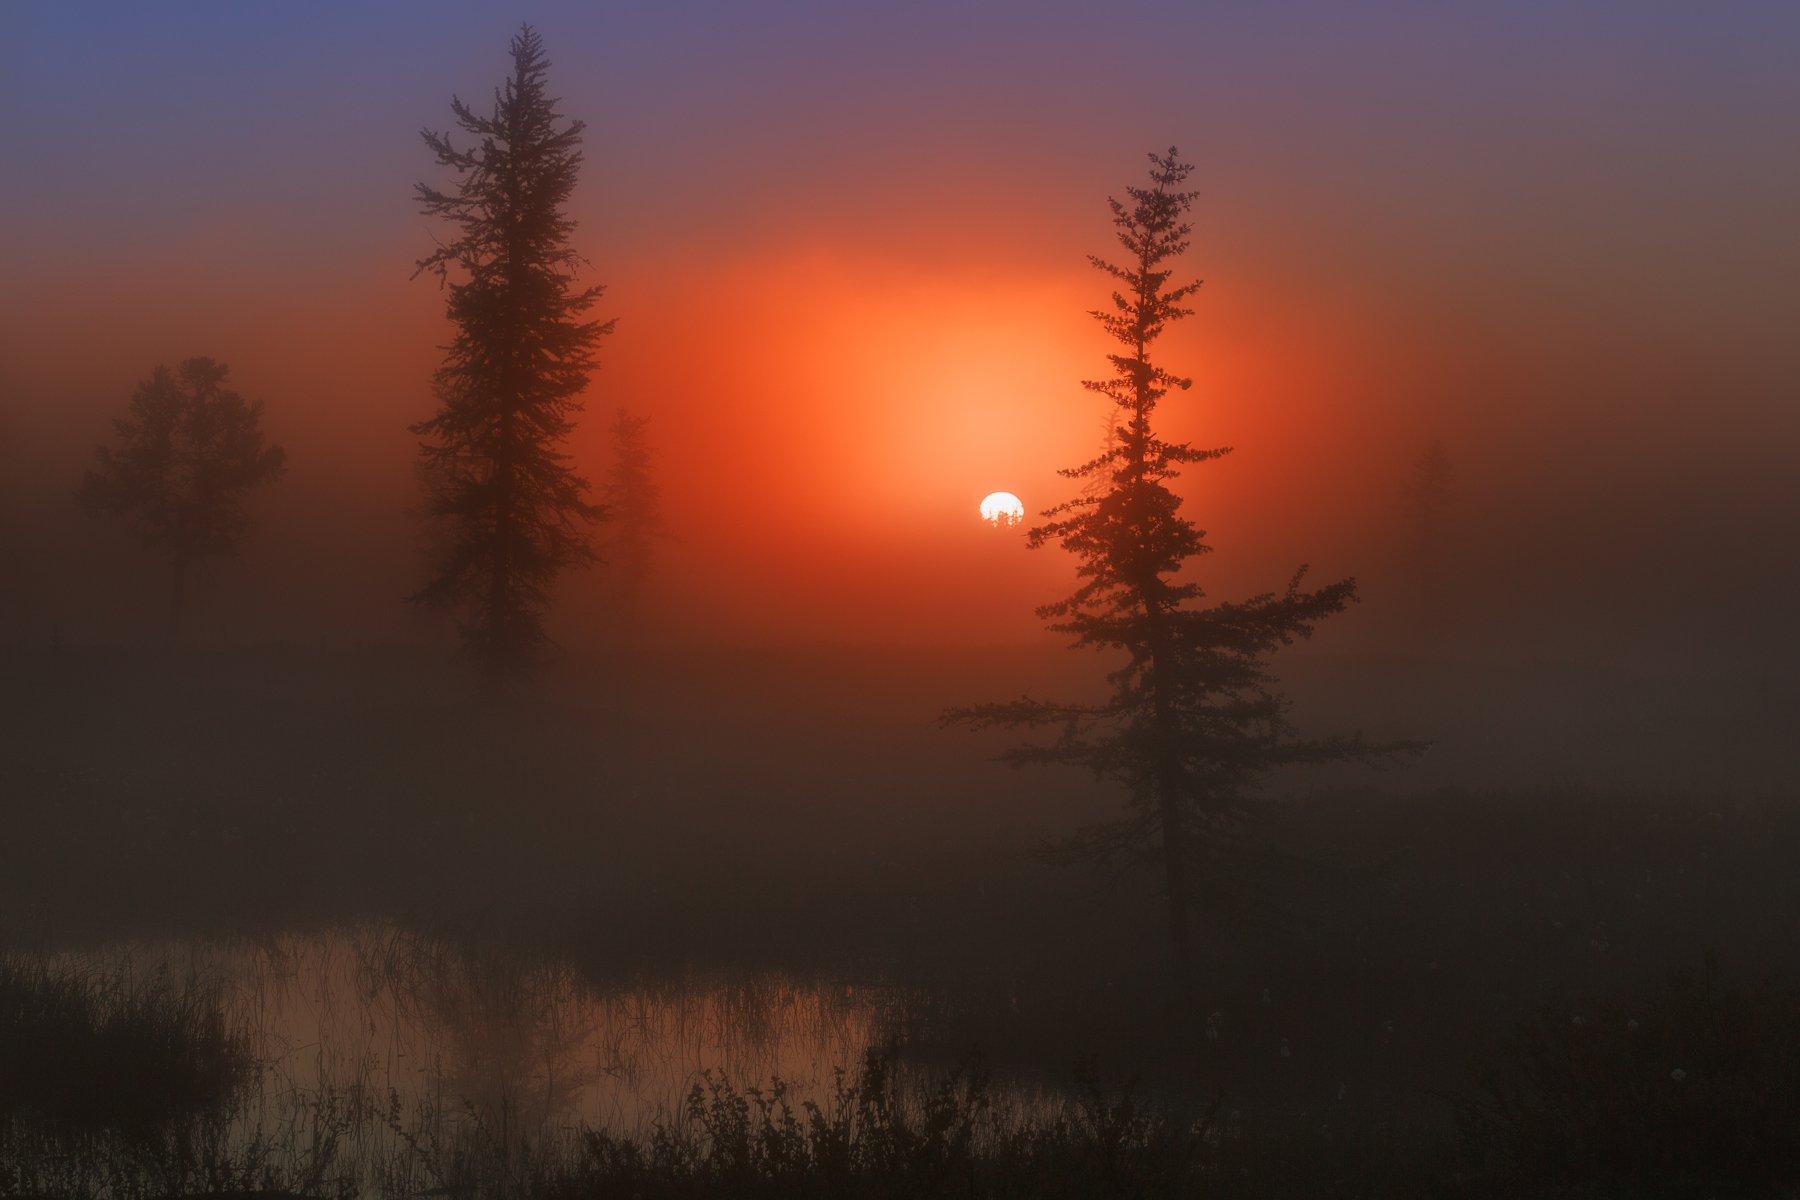 рассвет, туман, ямал, янао, уренгой,  новыйуренгой,, Камиль Нуреев